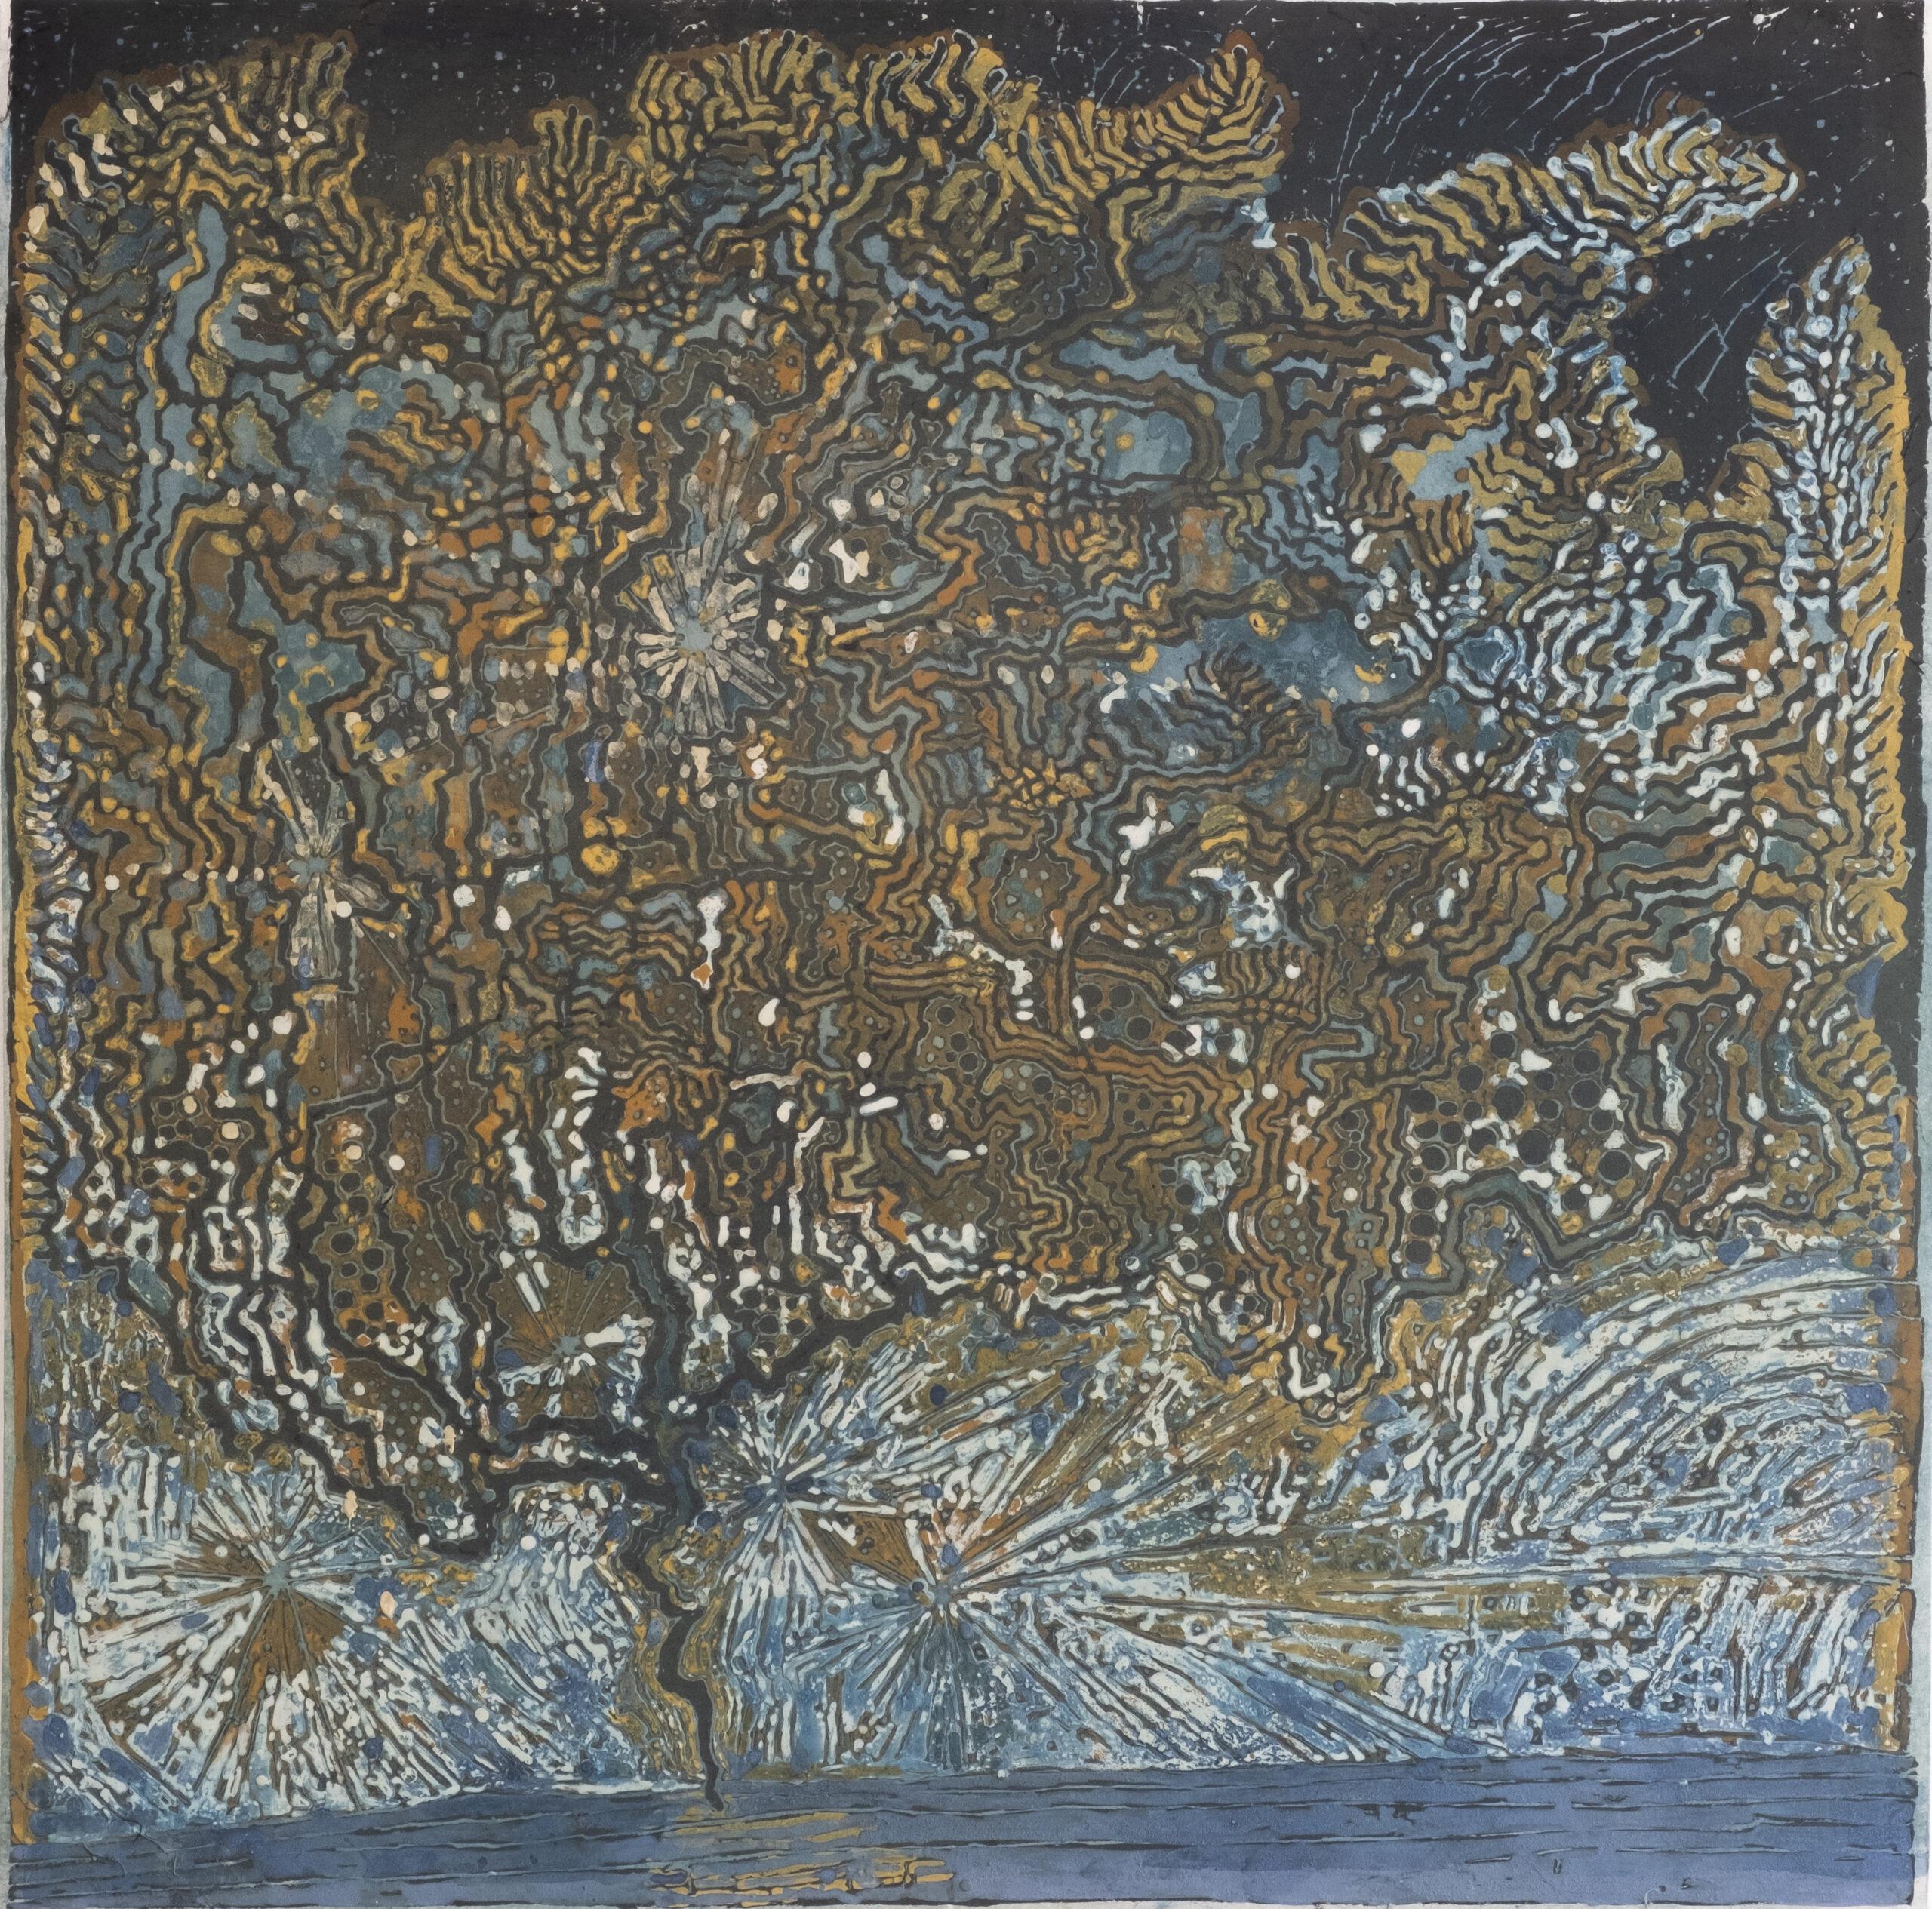 Micheko Toko Izumi Apple Tree at Dawn 00002